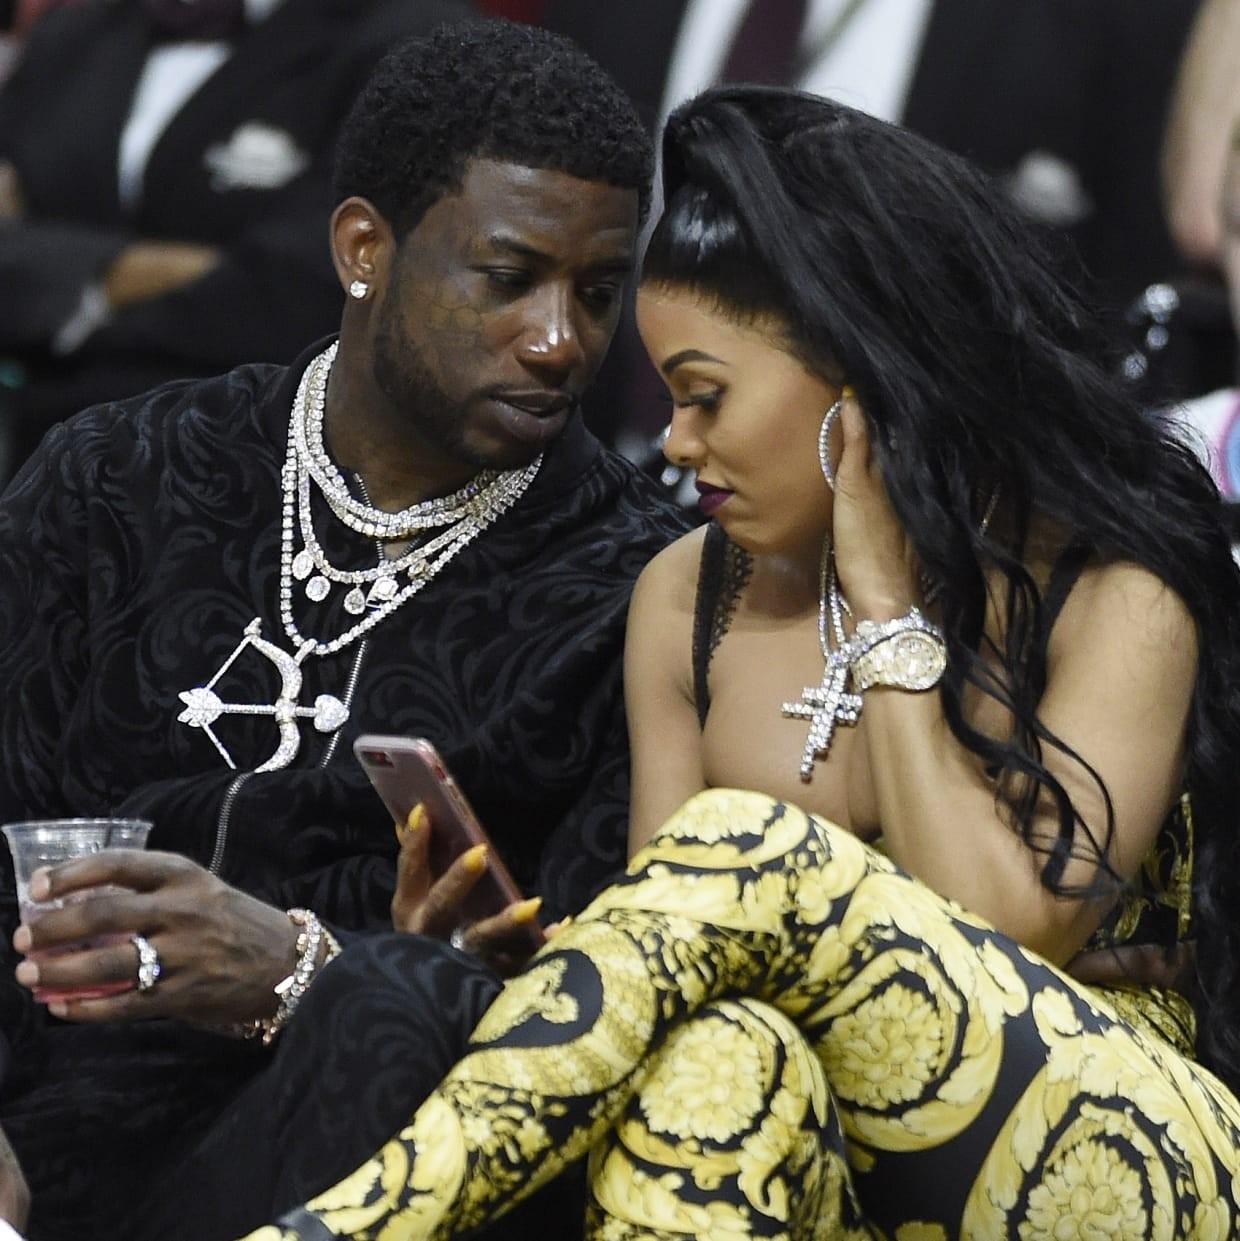 7 months after their lavish wedding, Gucci Mane has unfollowed his wife Keyshia Ka